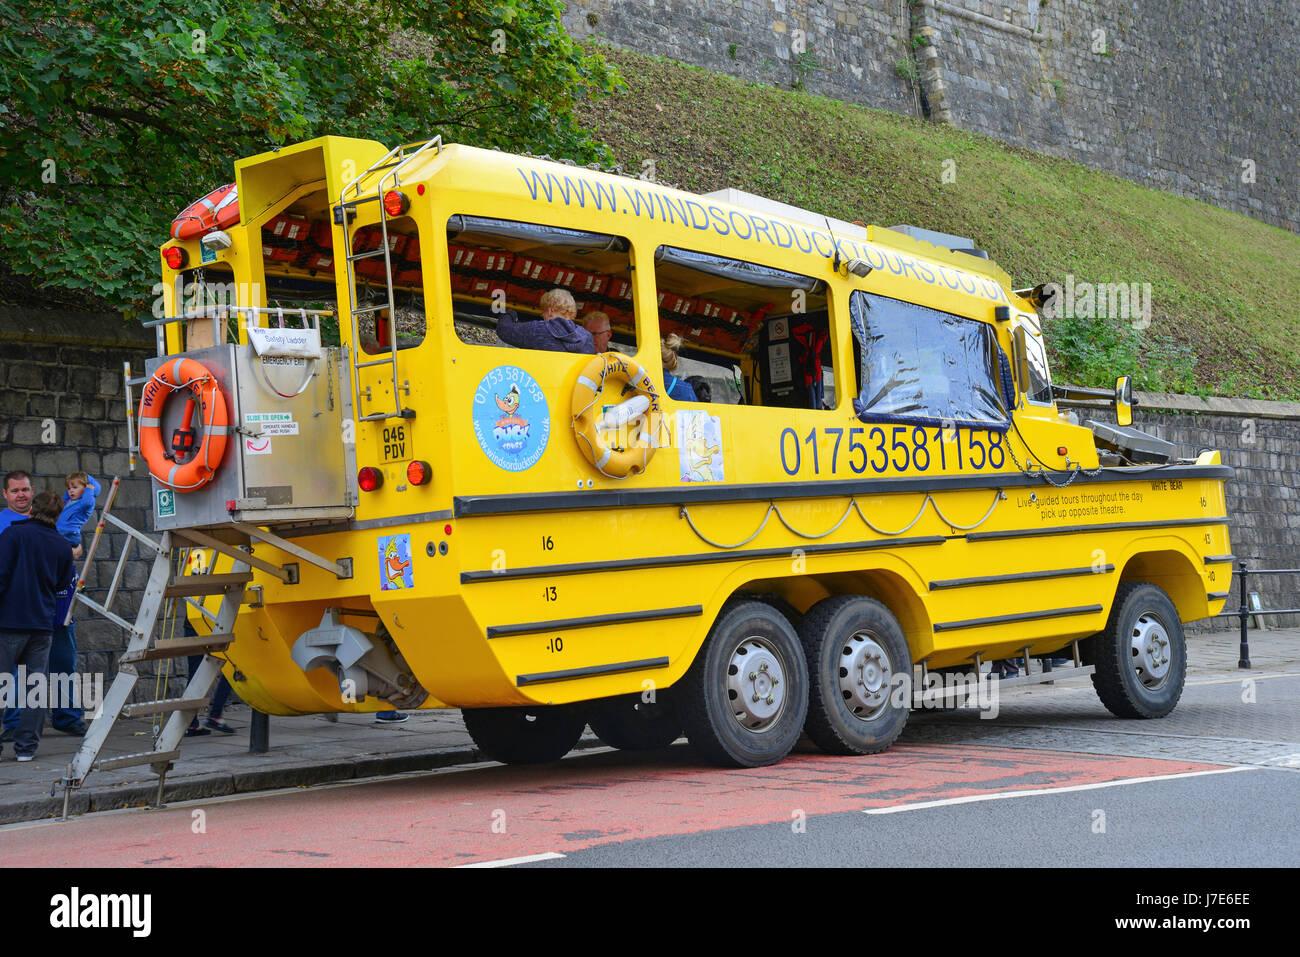 Windsor Amphibious Duck Tours vehicle, High Street, Windsor, Berkshire, England, United Kingdom - Stock Image